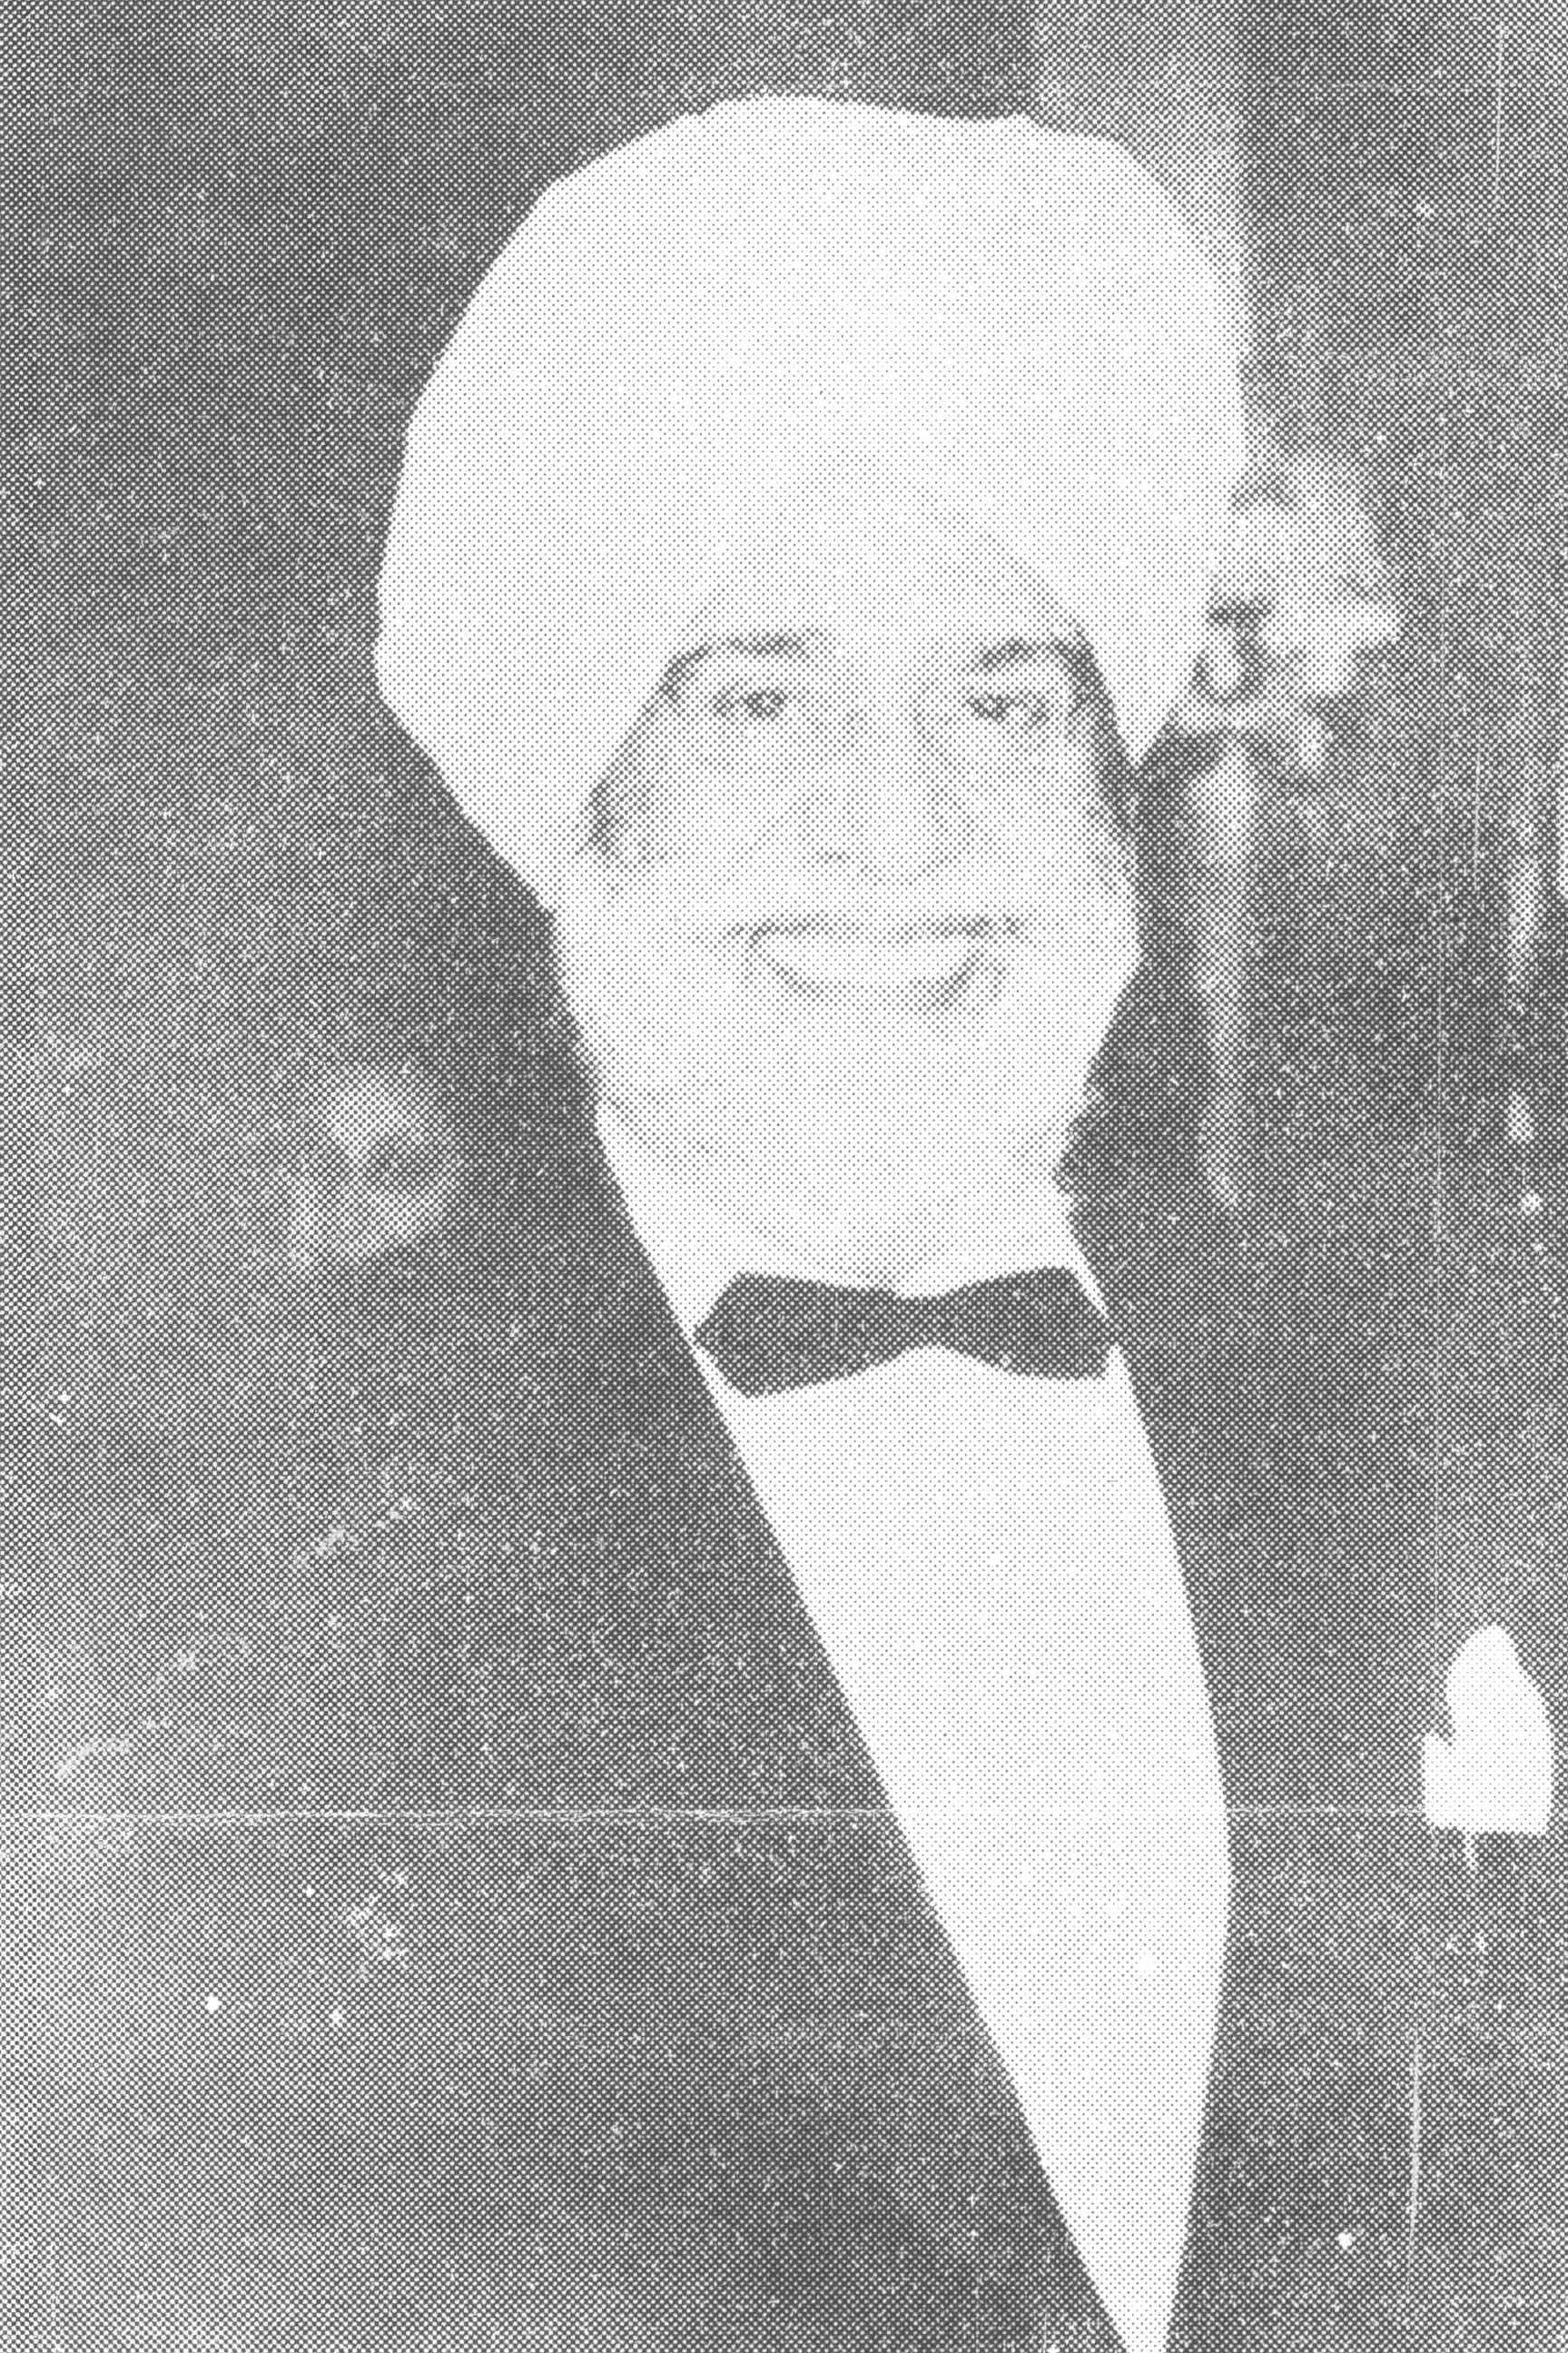 Profile image of Puri, Gopal Singh